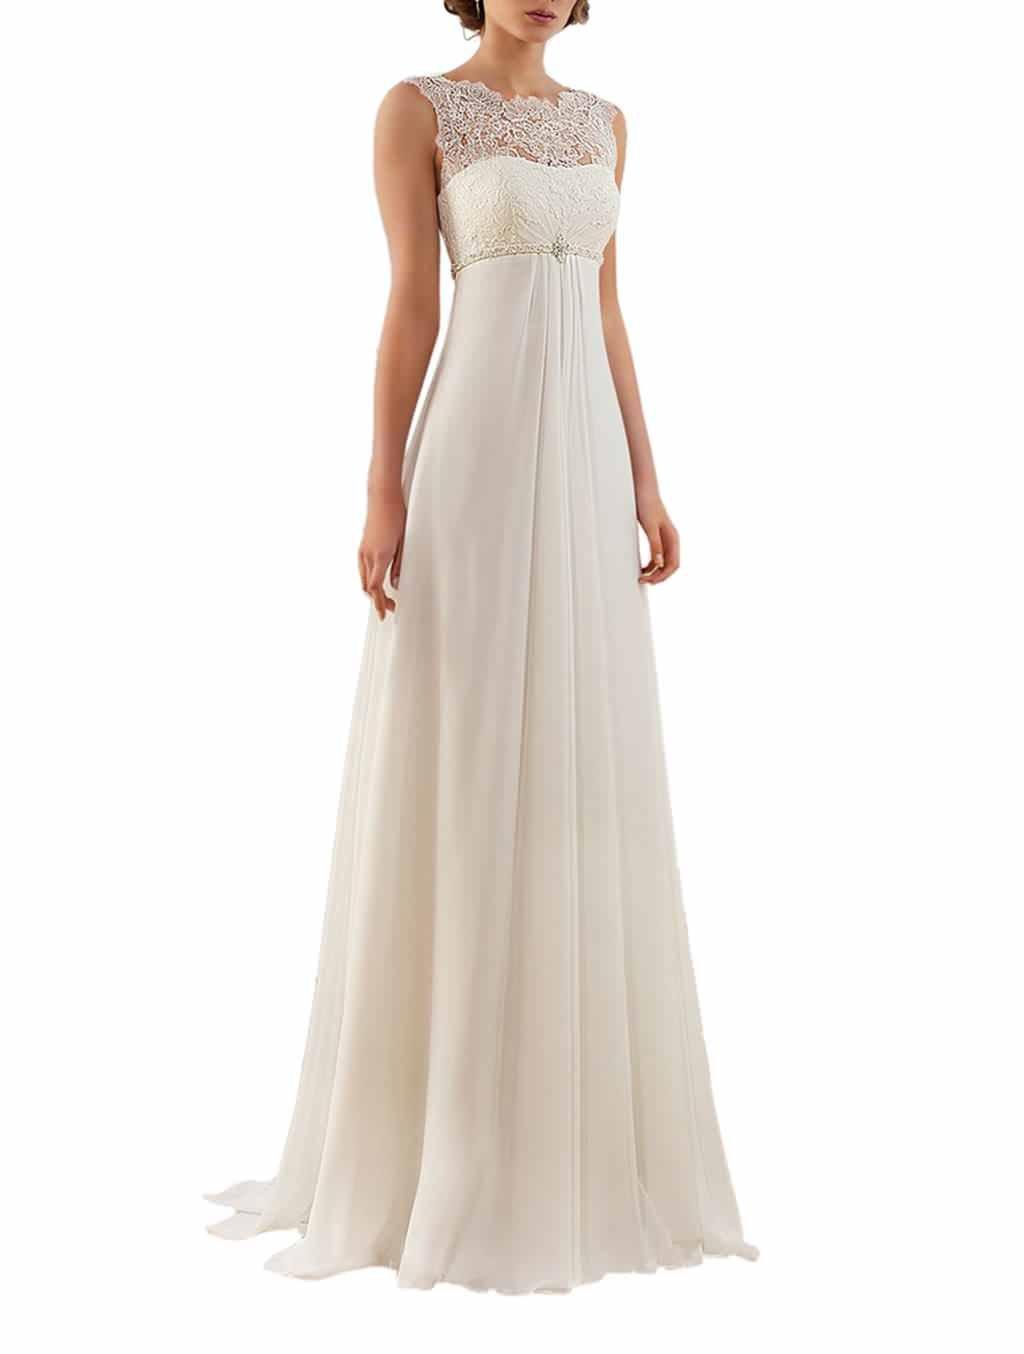 Half Flower Bridal Chiffon Empire Waist Wedding Dresses For Bride A line Floor Length Wedding Gown US12